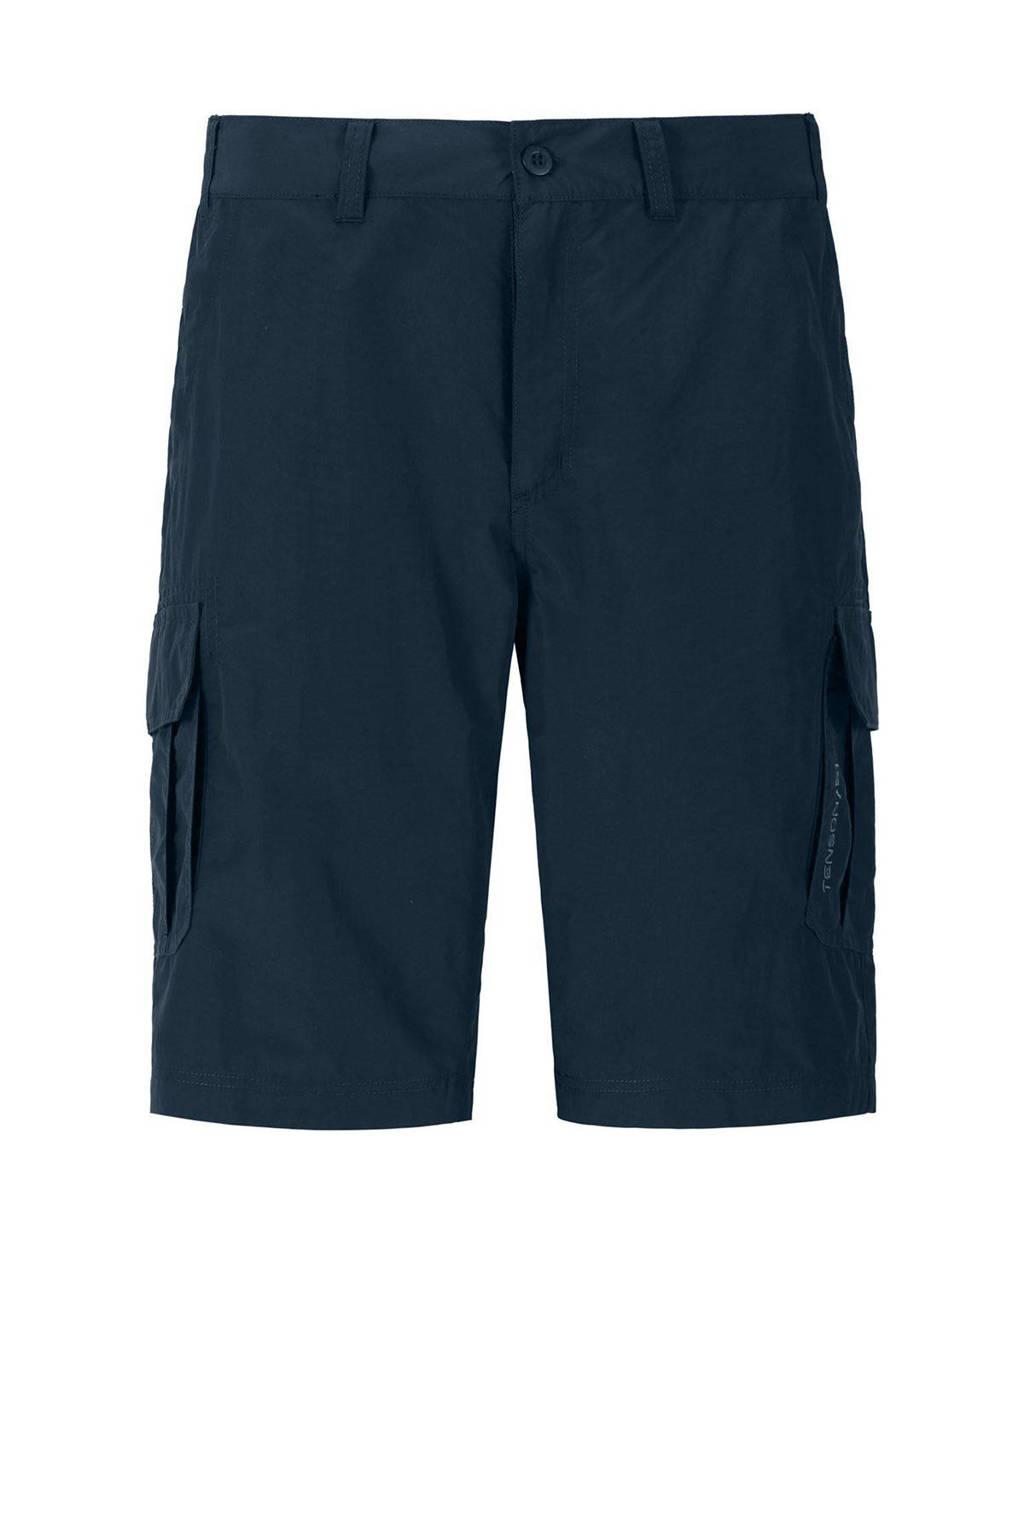 Tenson outdoor short Tom donkerblauw, Donkerblauw